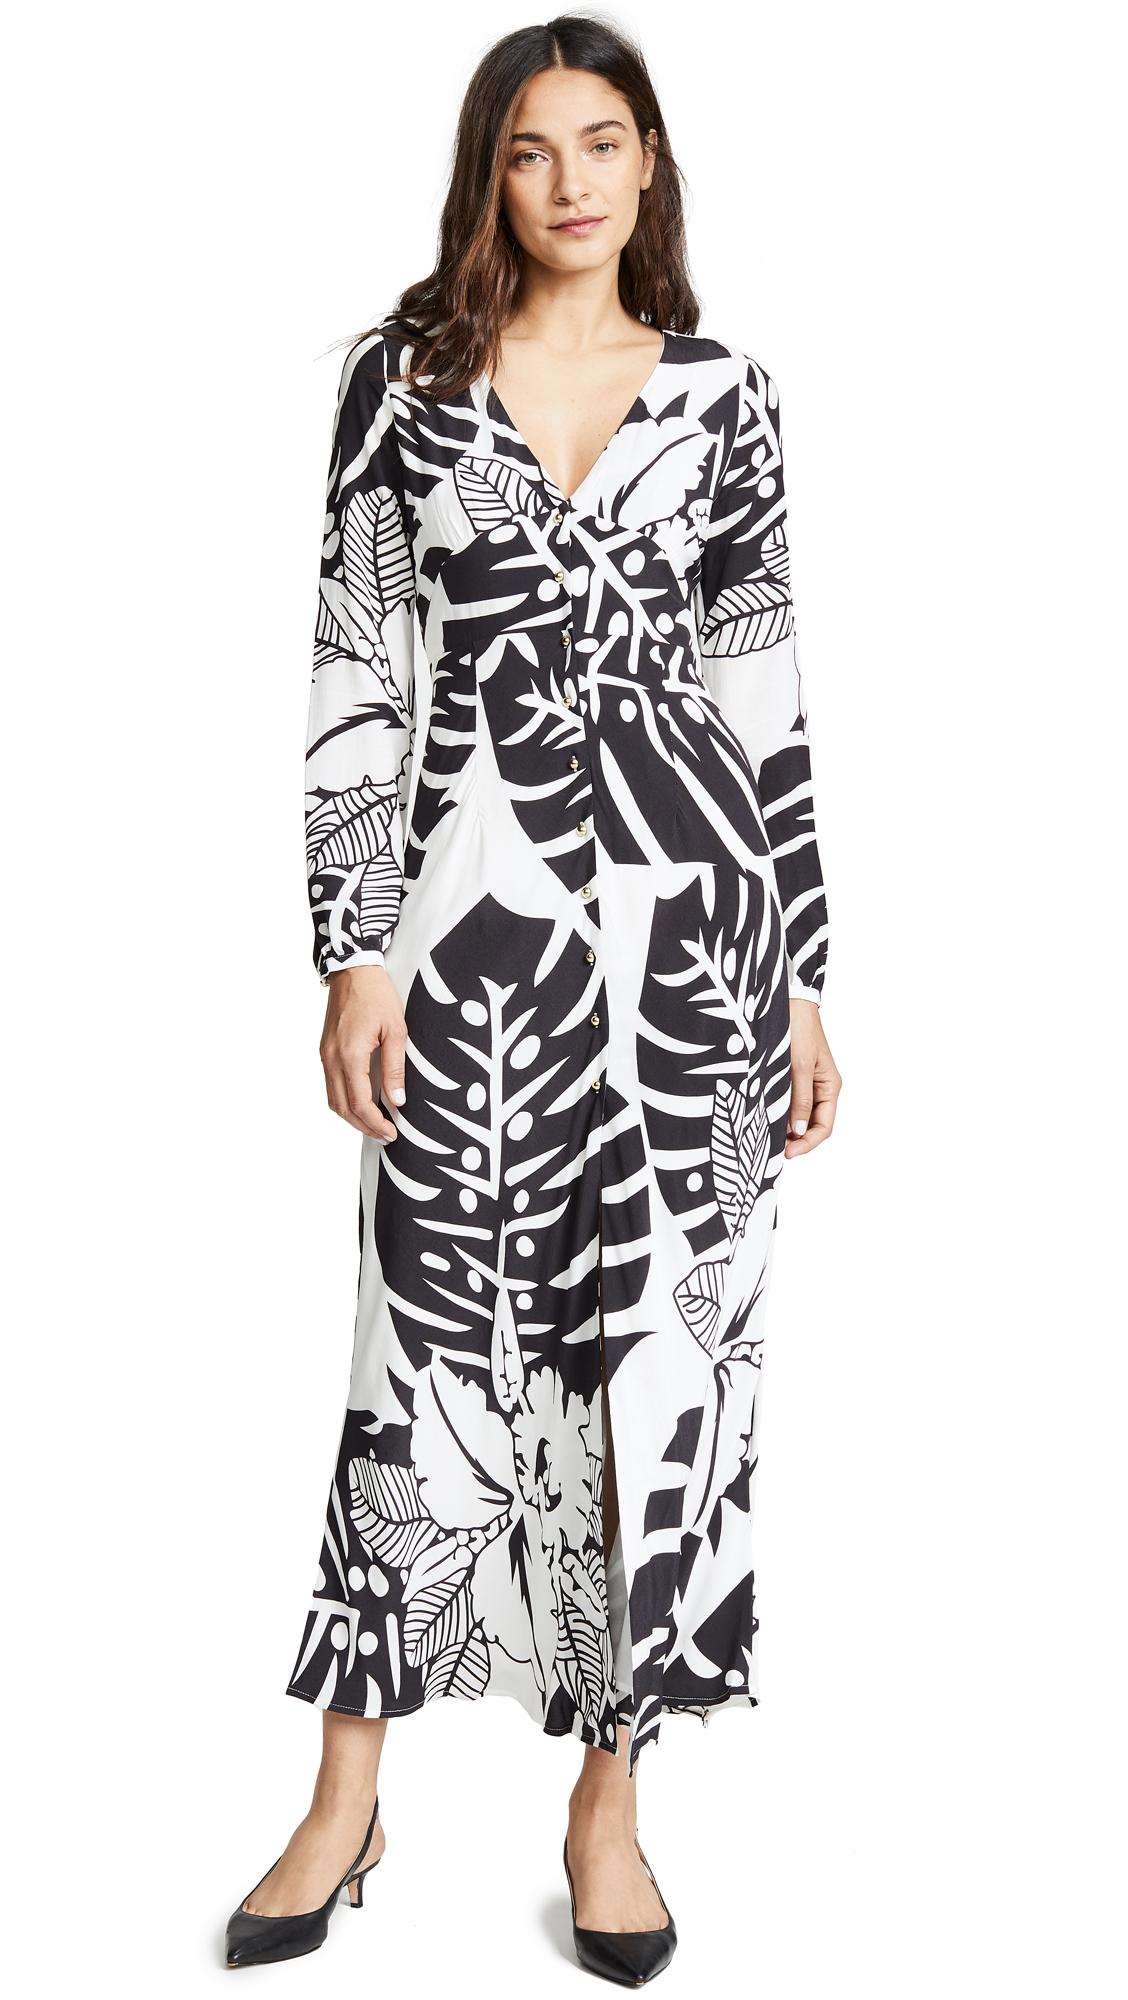 VETIVER Bahama Mama Dress in Black/White